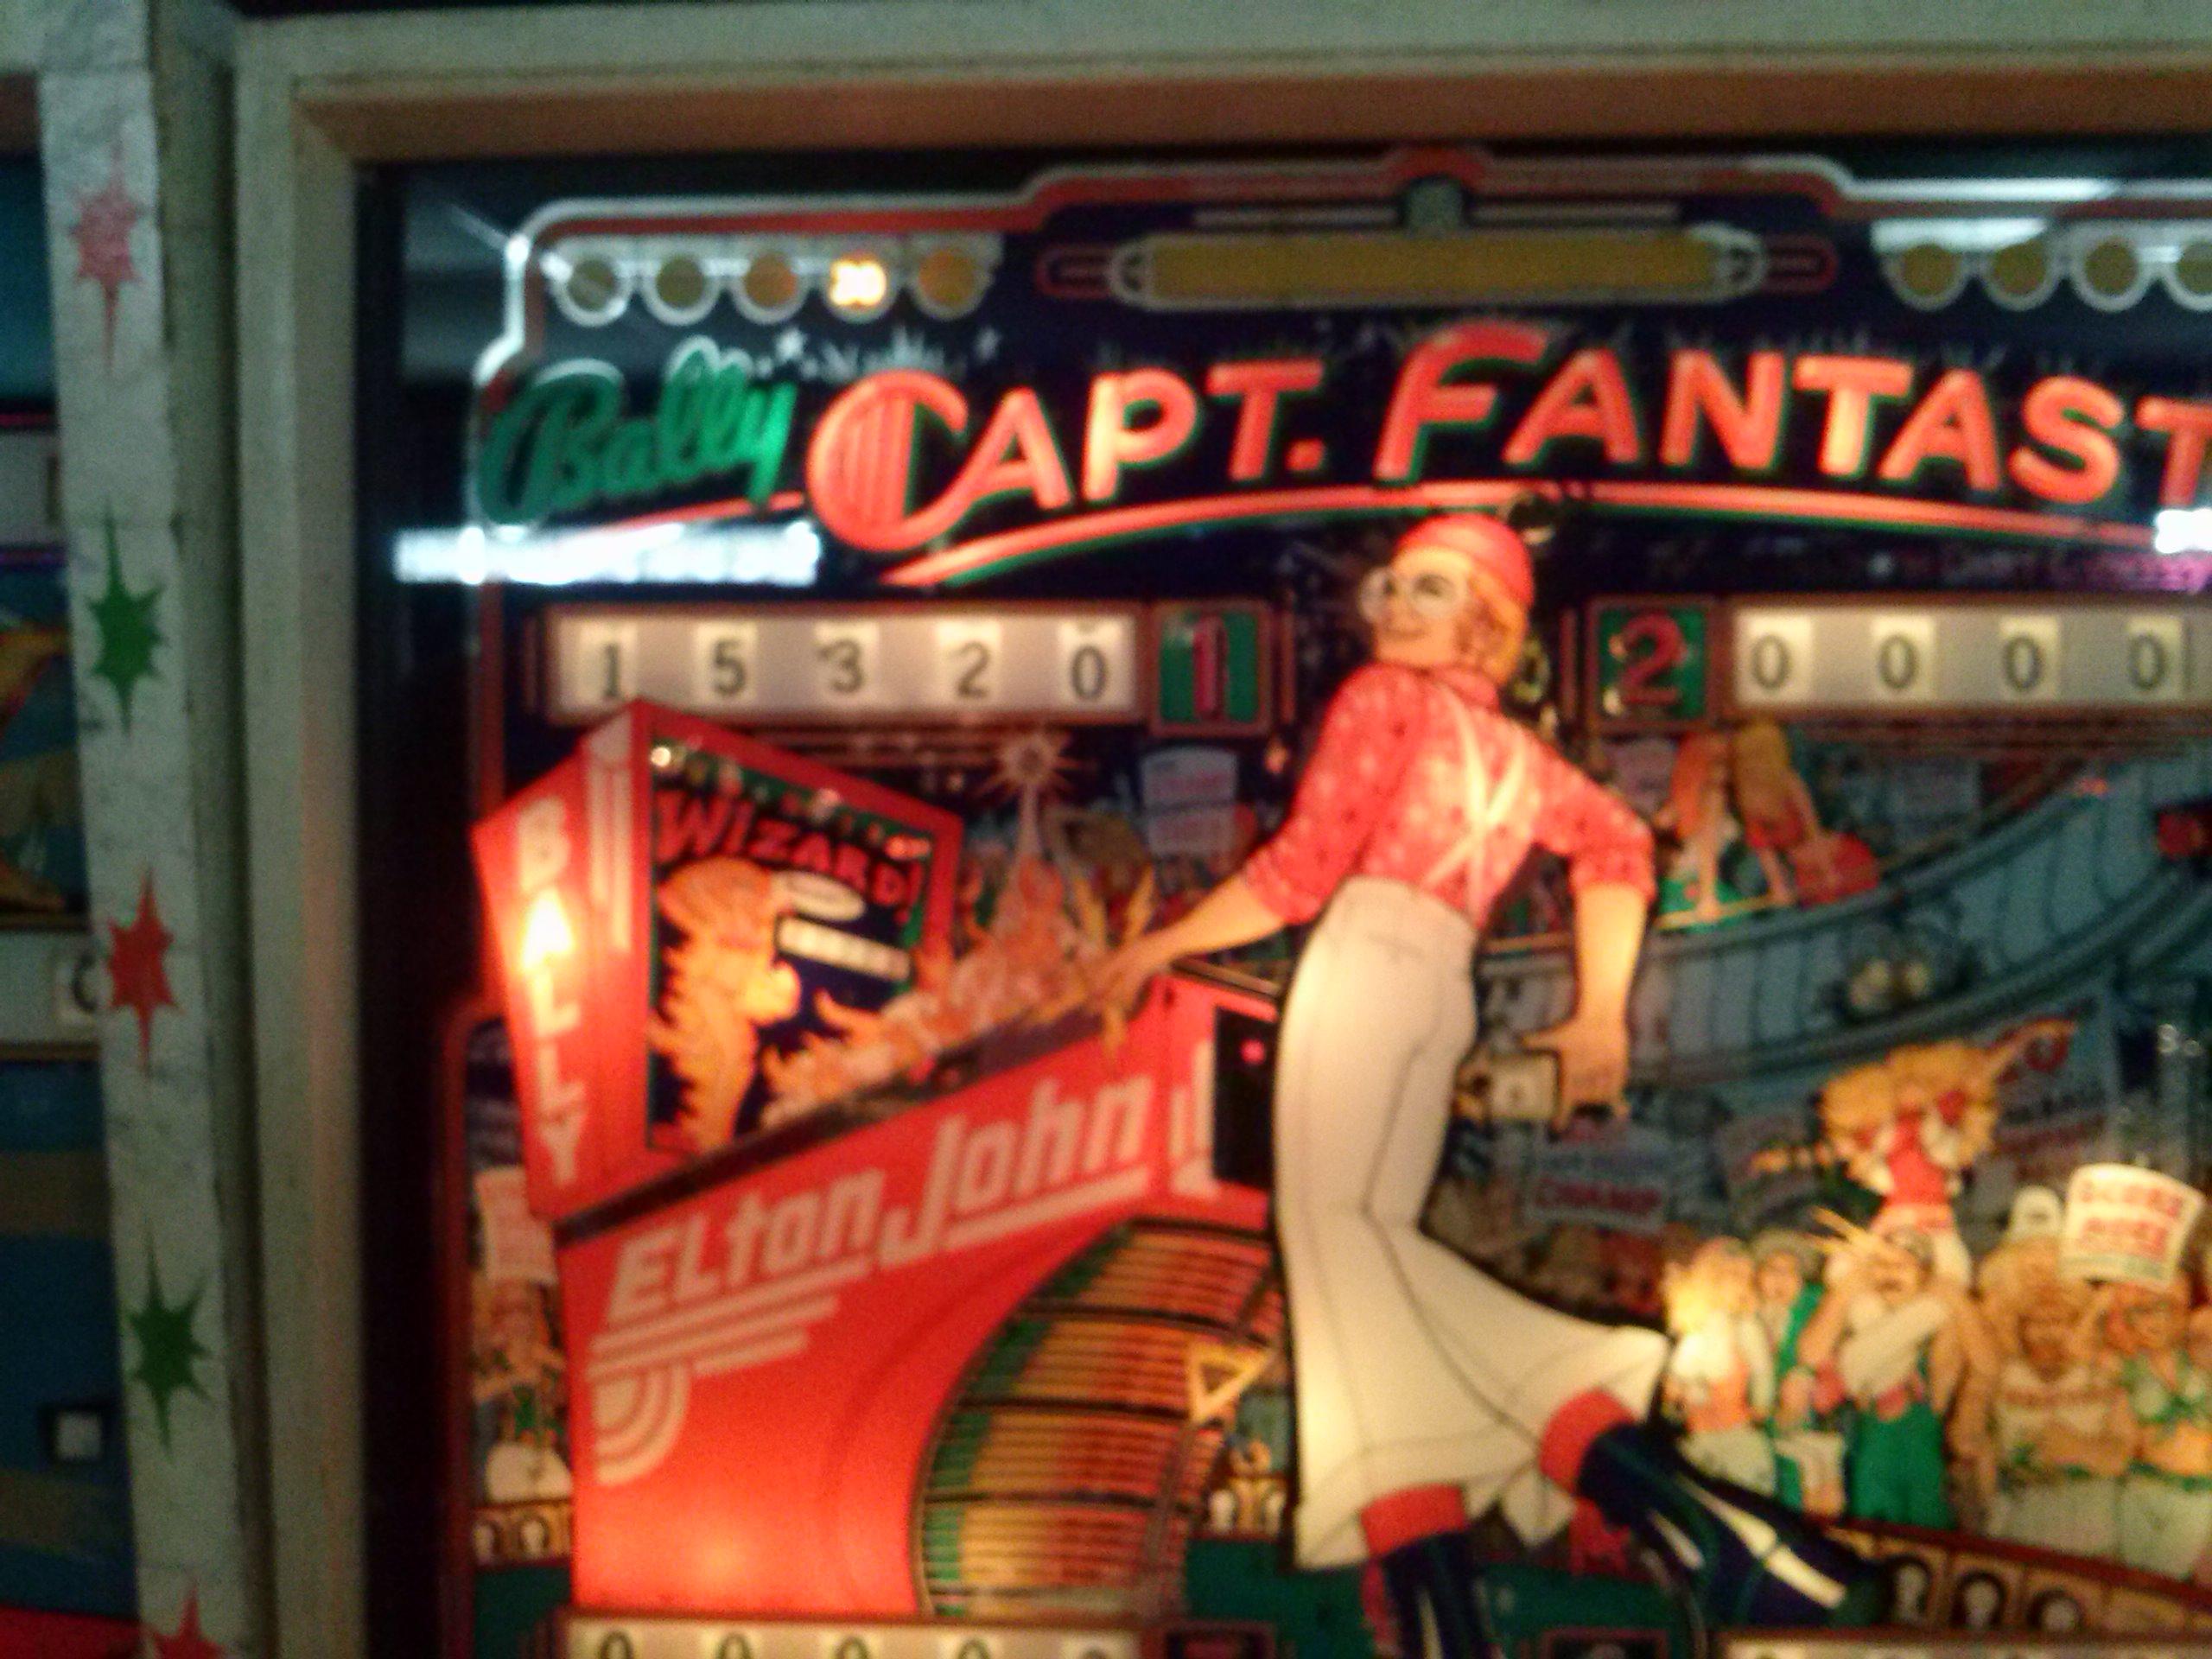 nester: Capt. Fantastic (Pinball: 3 Balls) 15,320 points on 2014-05-20 22:39:51